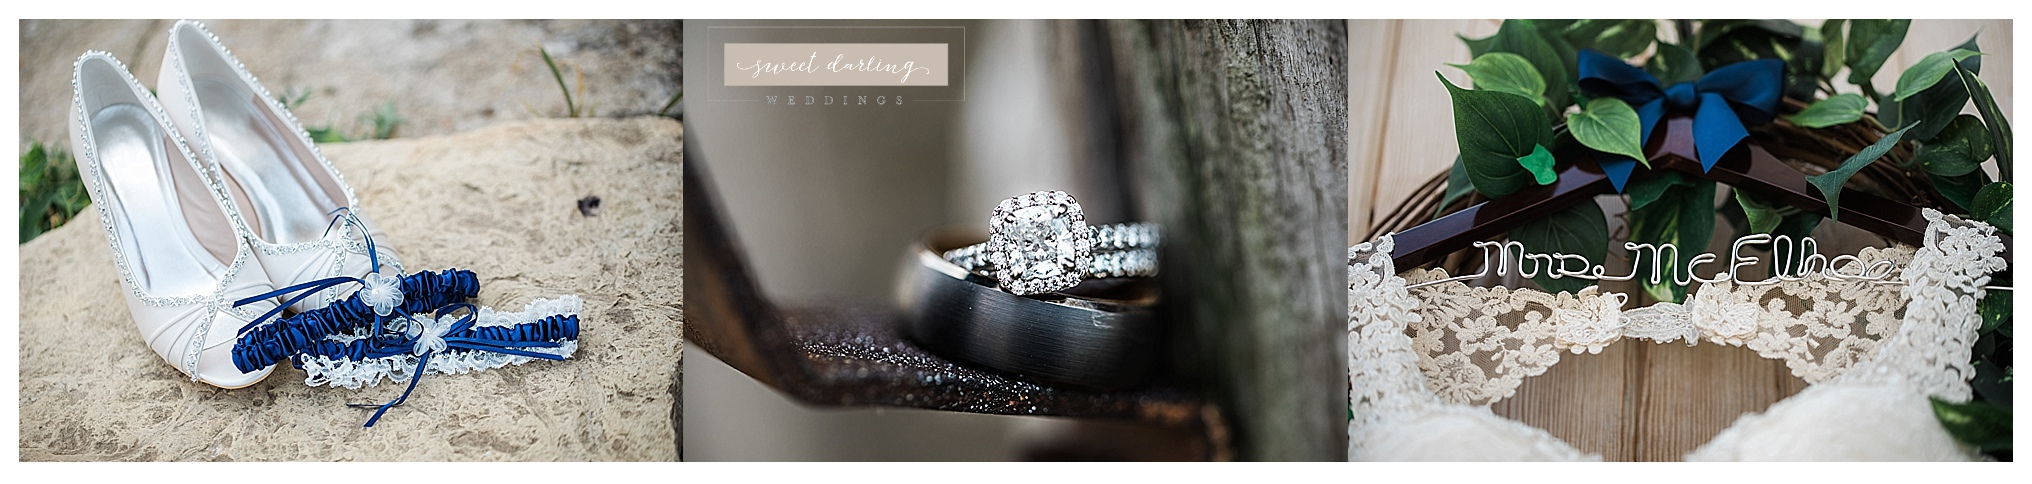 Paxton-illinois-engelbrecht-farmstead-romantic-wedding-photographer-sweet-darling-weddings_1208.jpg